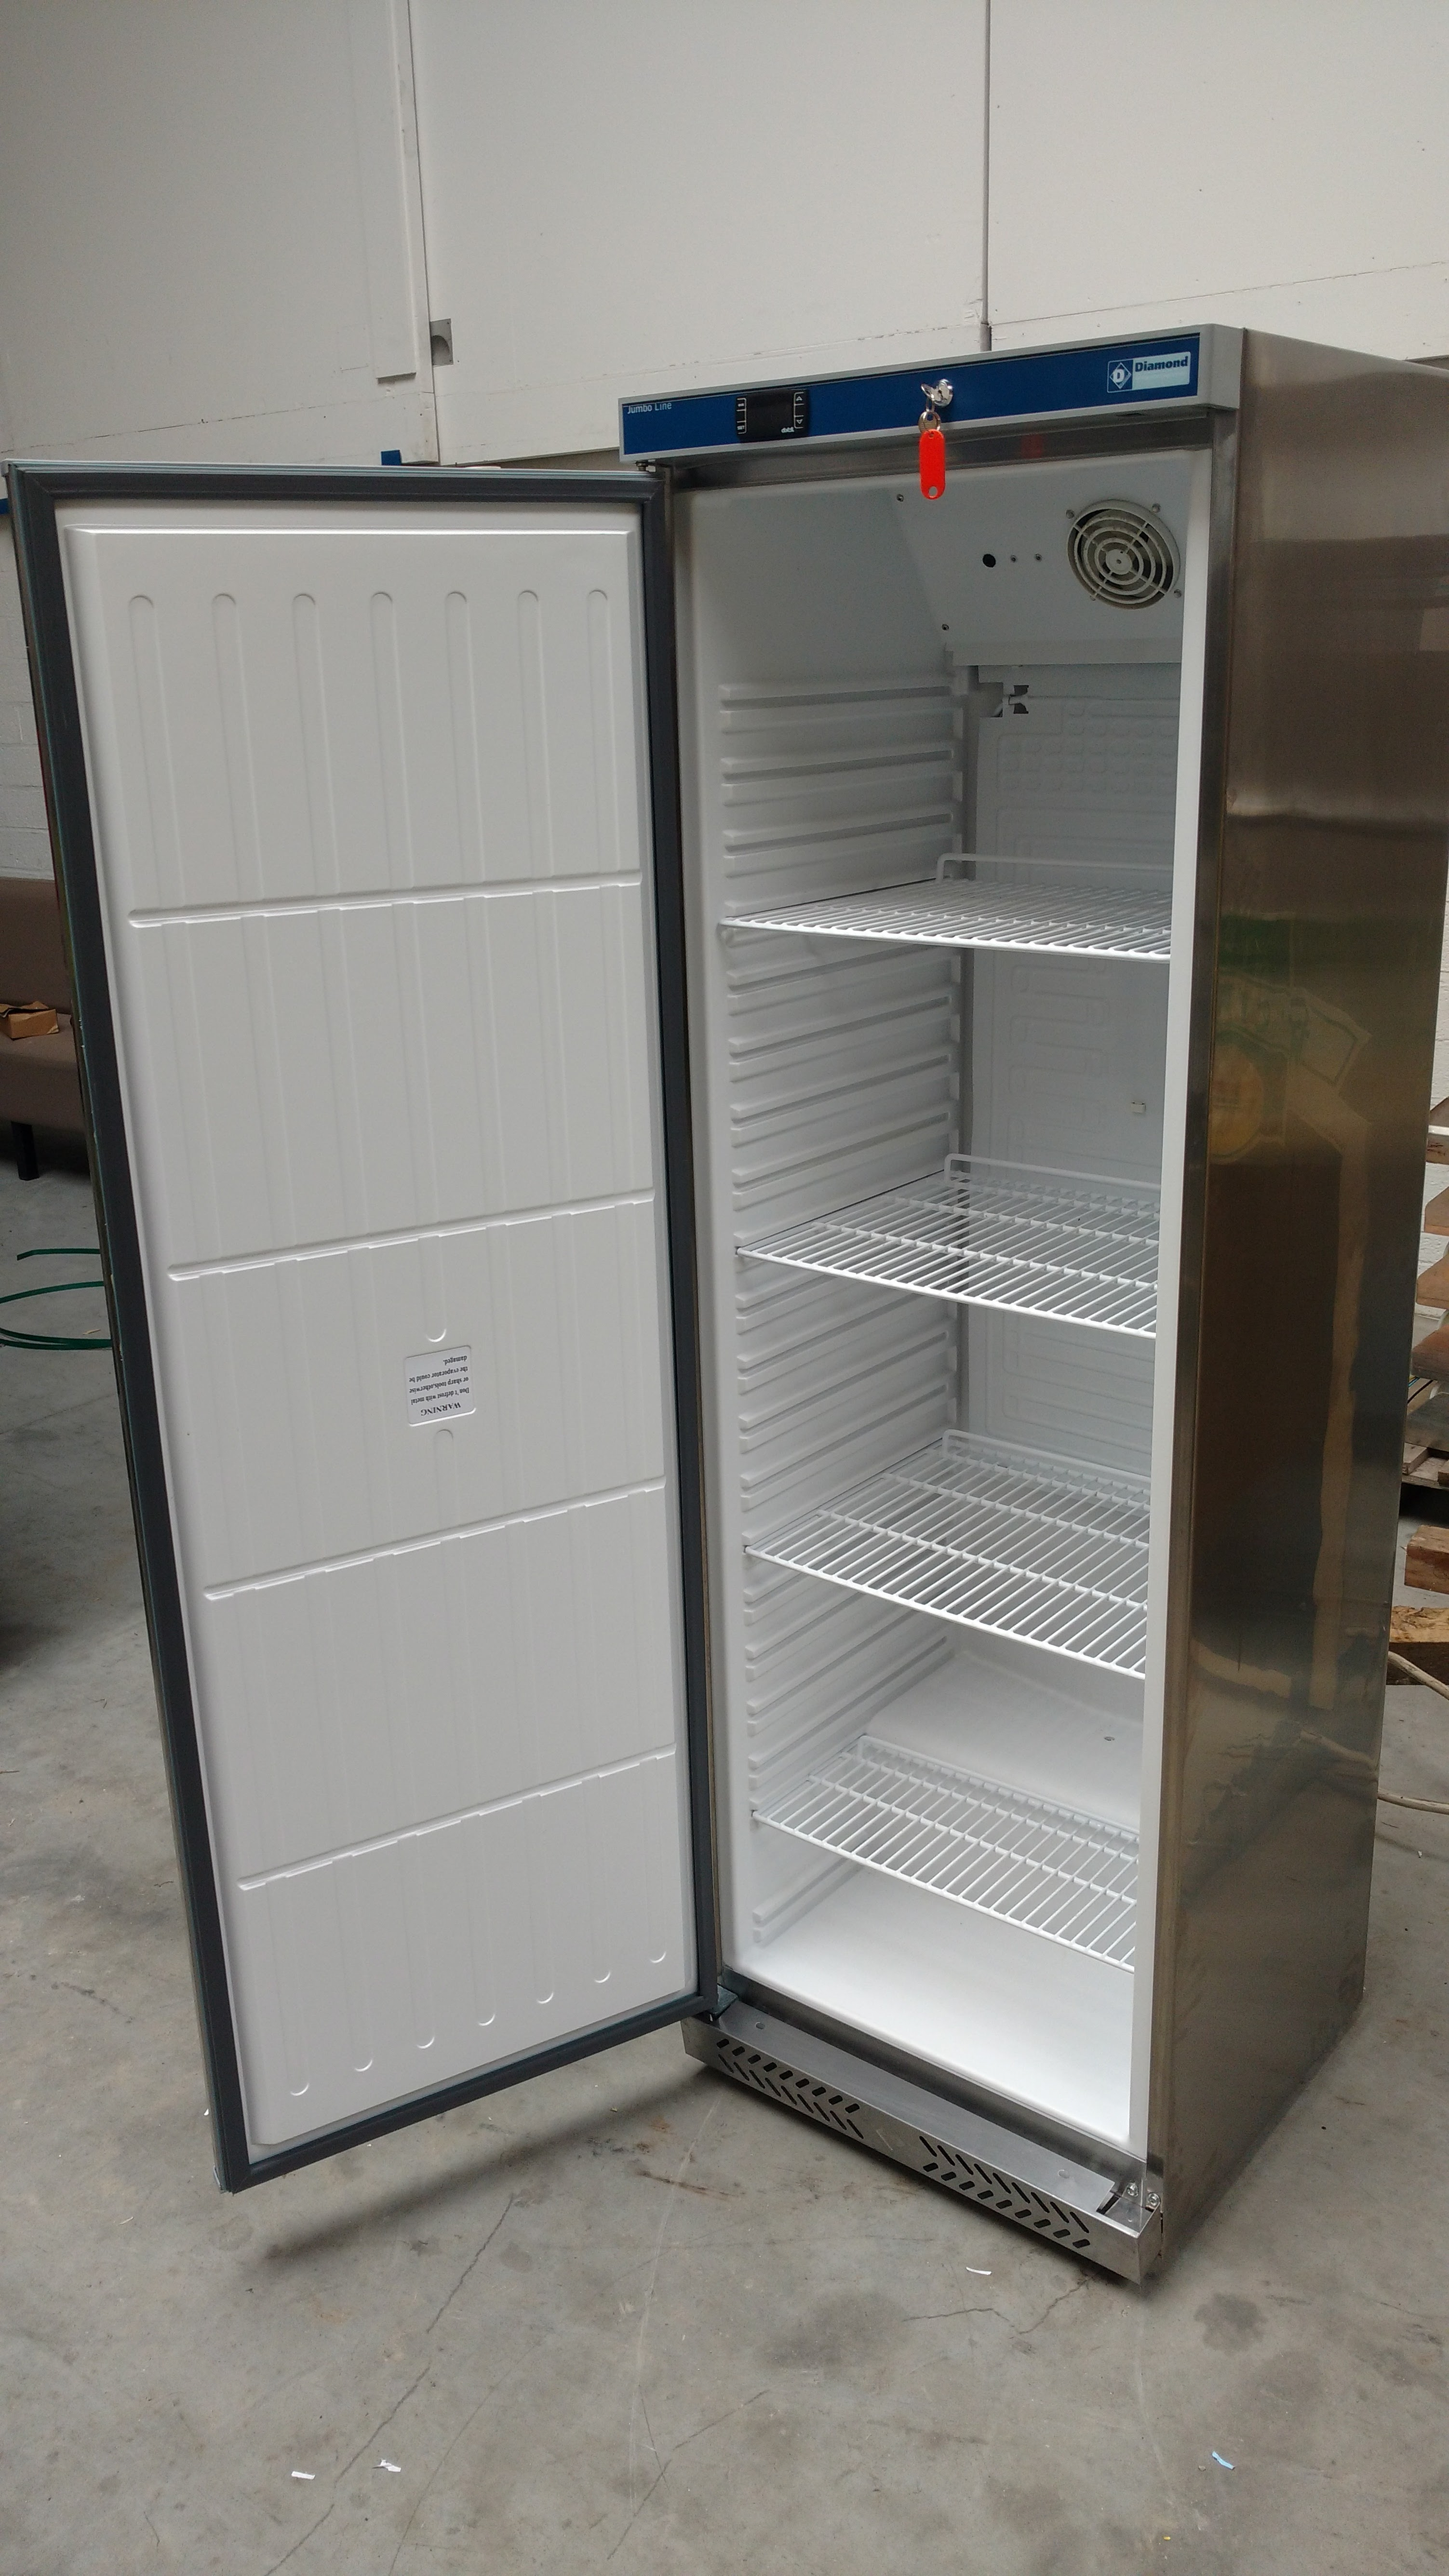 armoire frigorifique ventil e occasion diamond bart. Black Bedroom Furniture Sets. Home Design Ideas